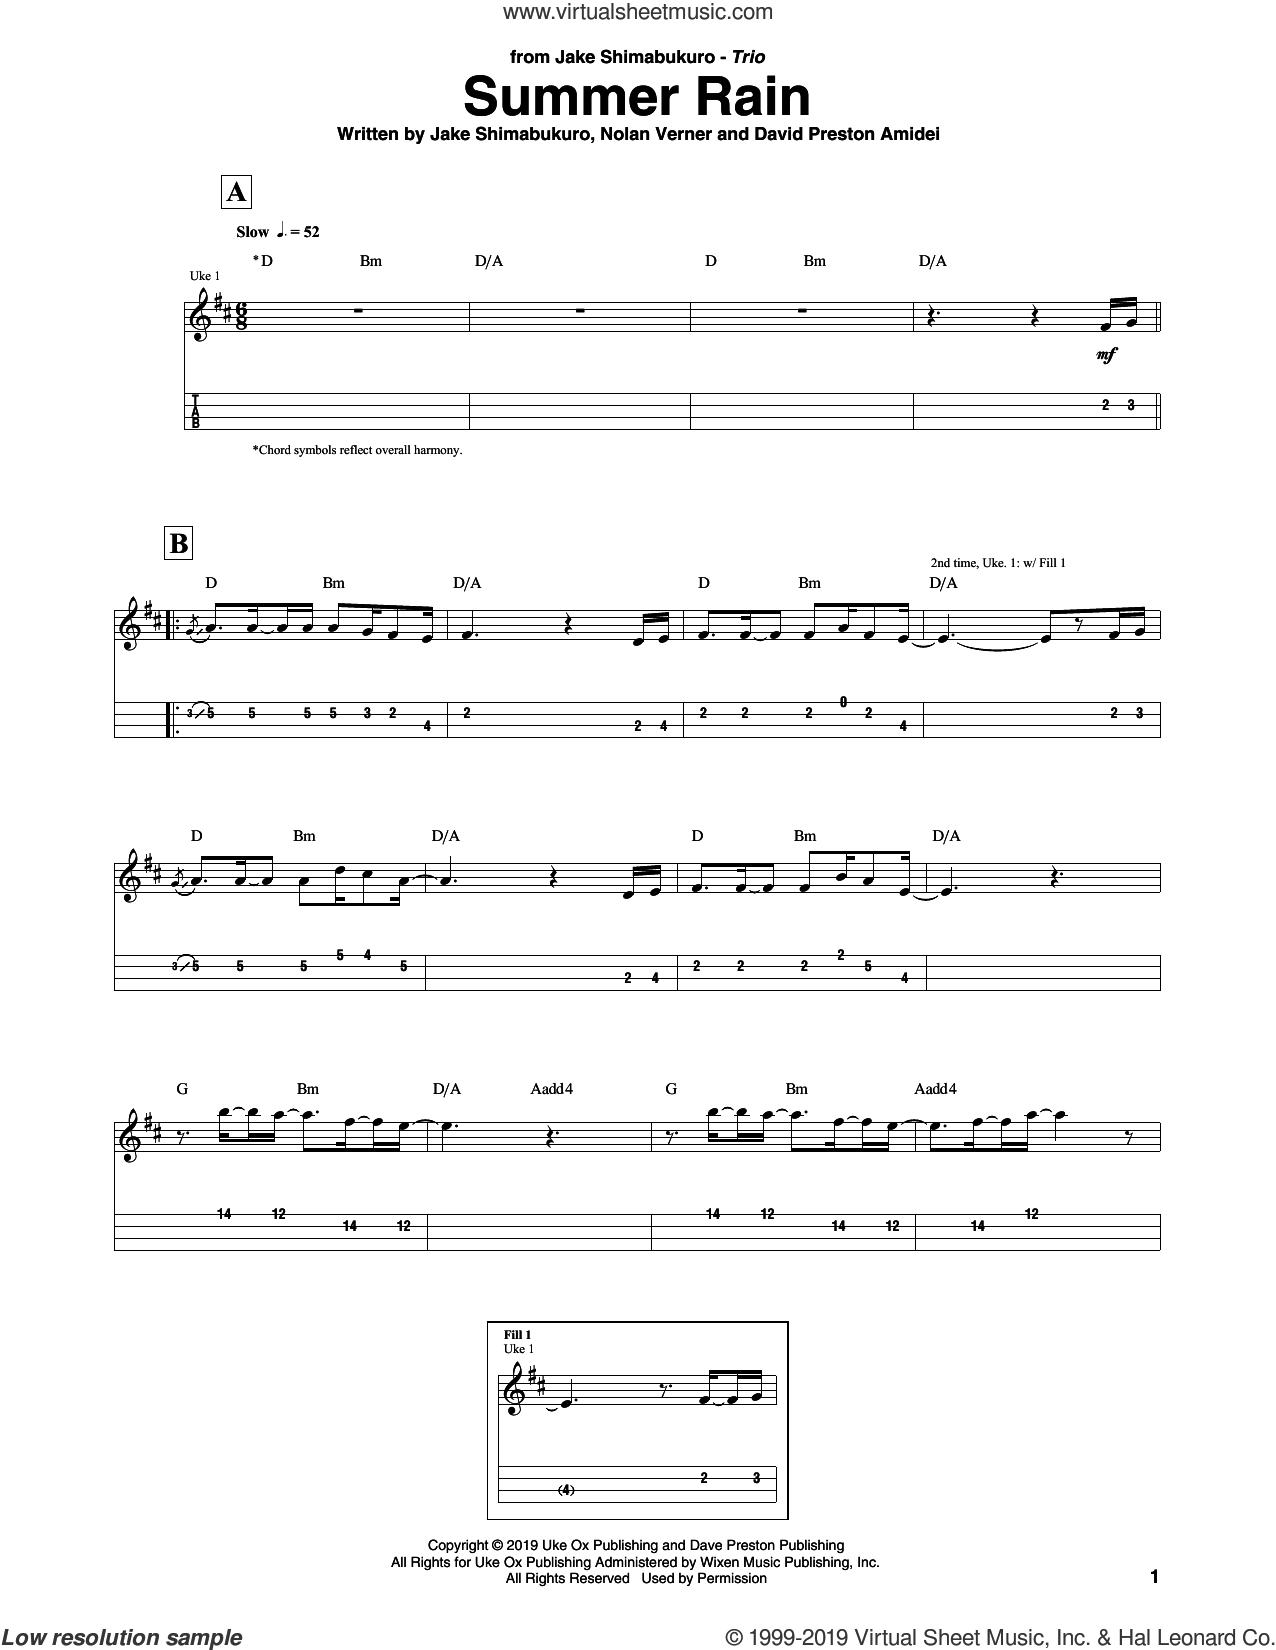 Summer Rain sheet music for ukulele (tablature) by Jake Shimabukuro Trio, David Preston Amidei, Jake Shimabukuro and Nolan Verner, intermediate skill level